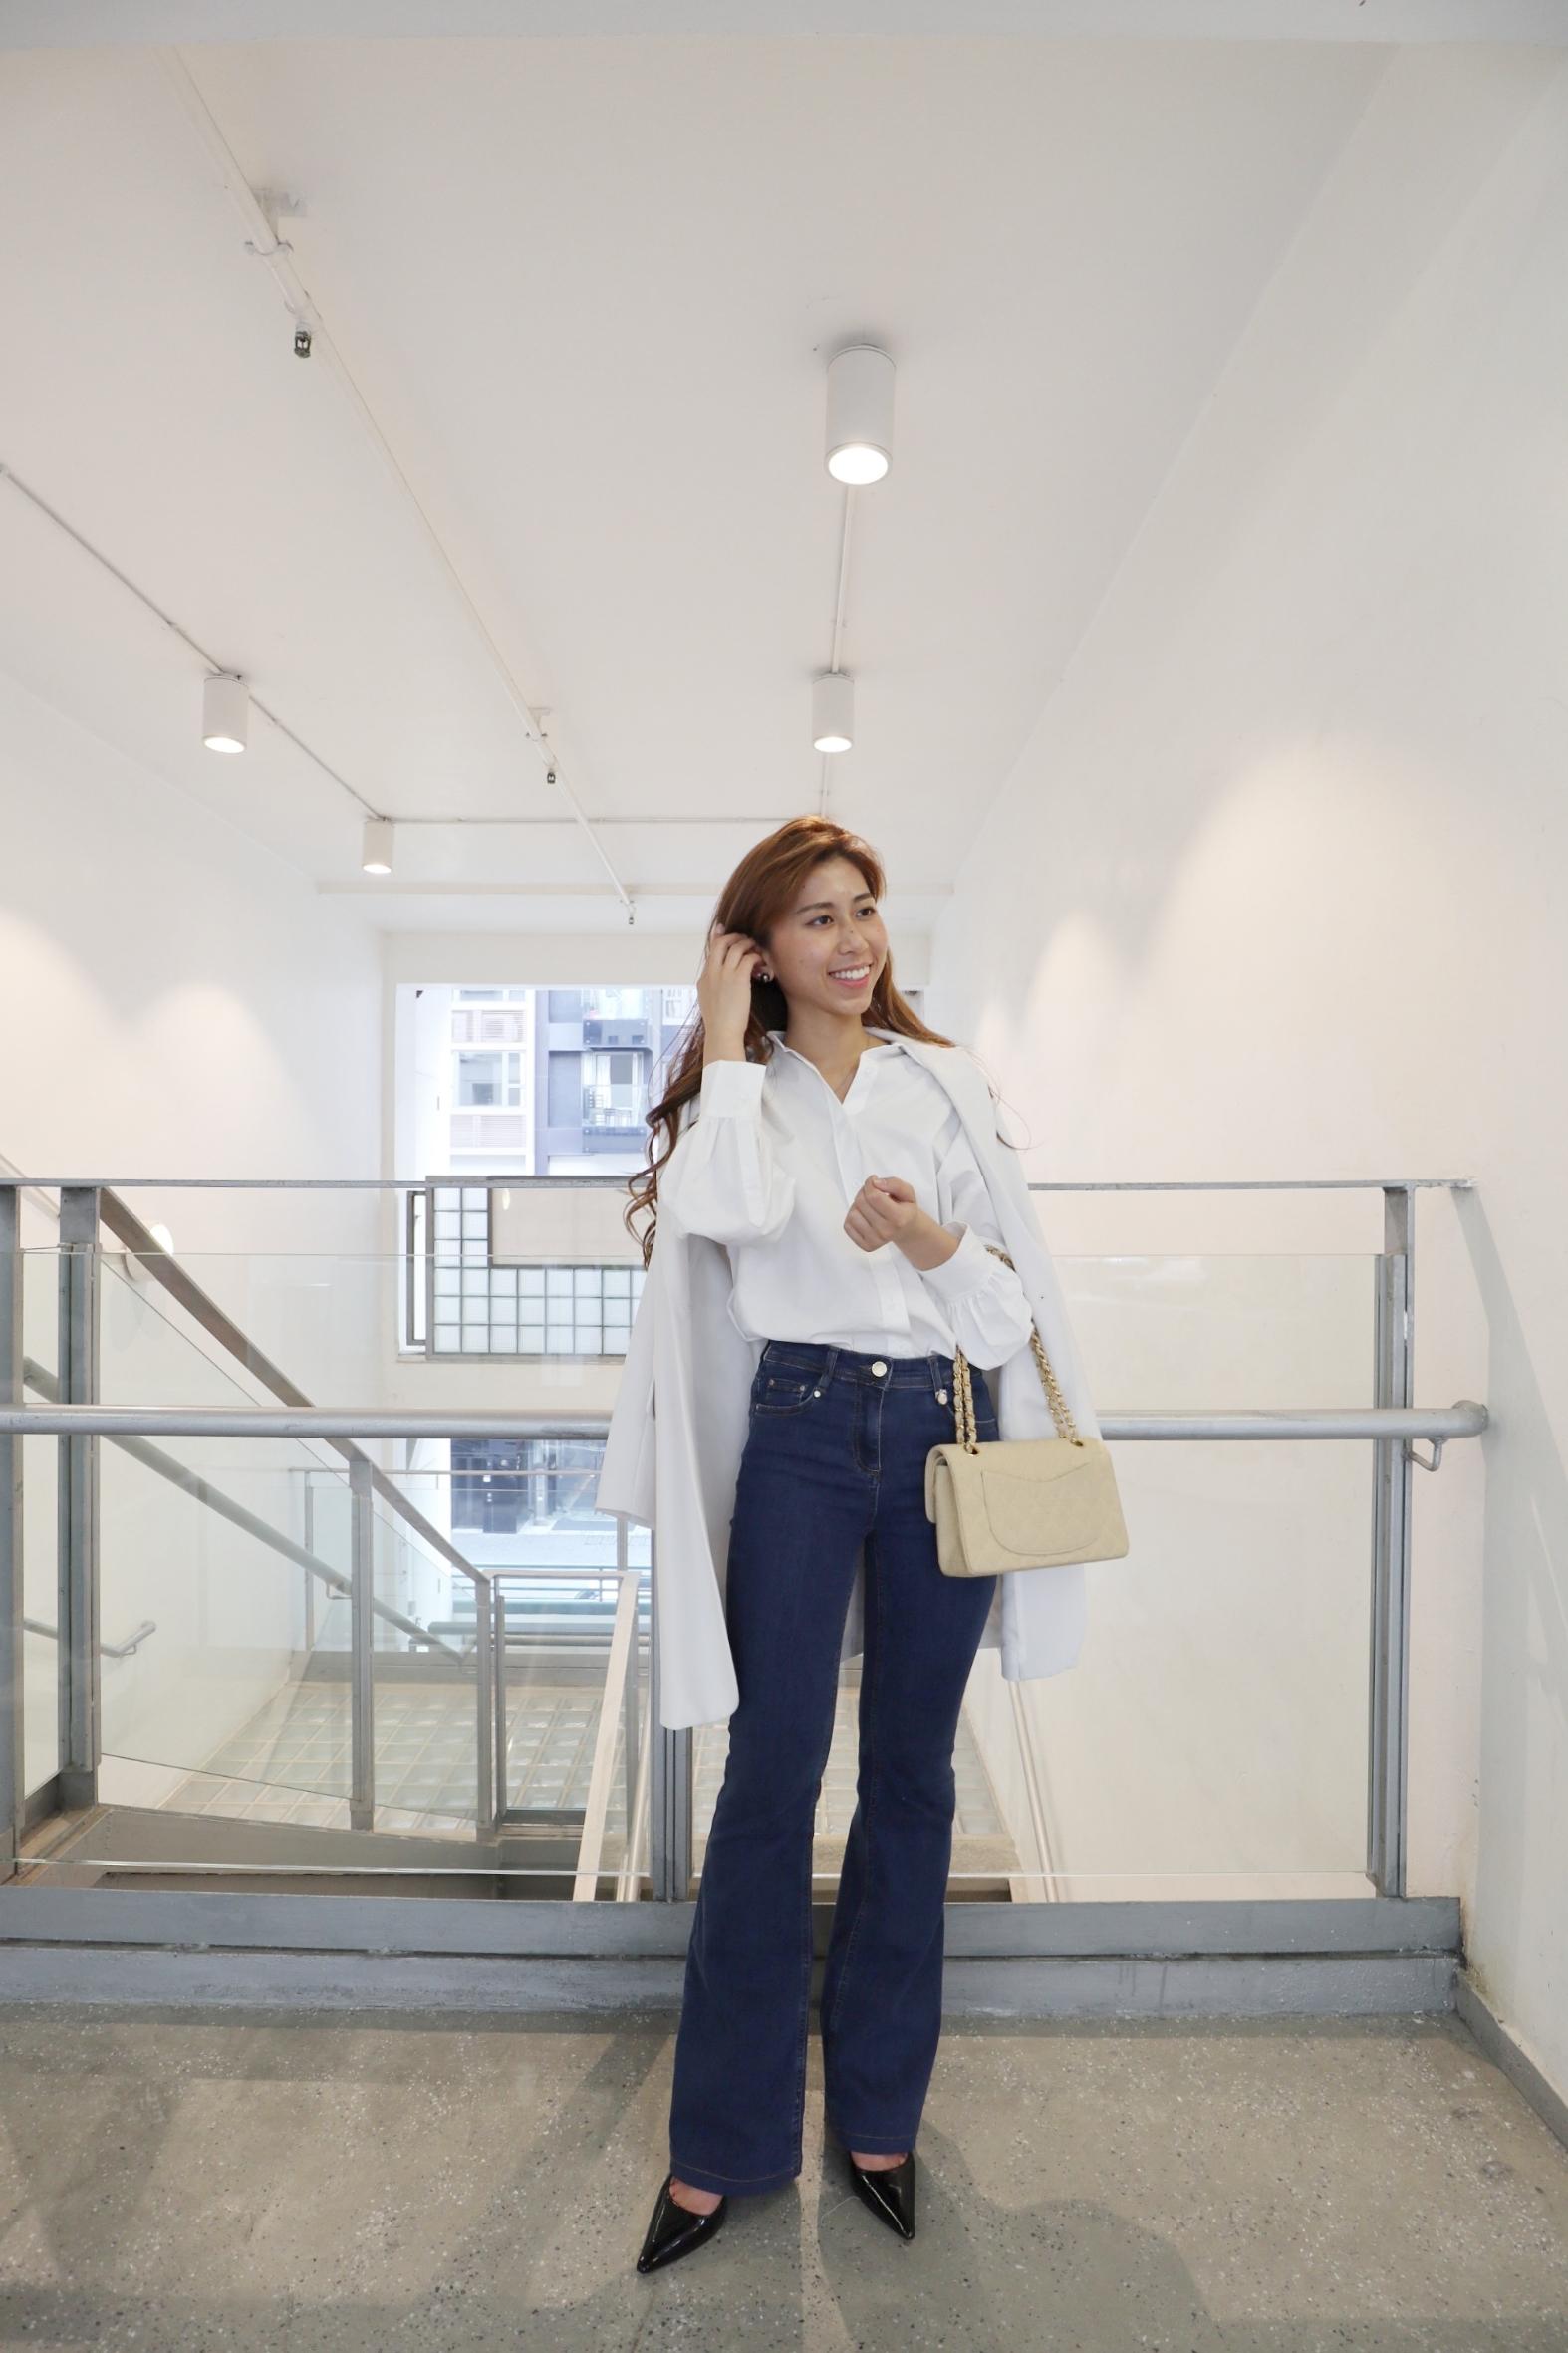 Shirt from Japan / Blazer from Japan / Pennyblack Jeans kick flare fit super stretch ($2000) / Chanel vintage /  Dior slingback in black patent calfskin